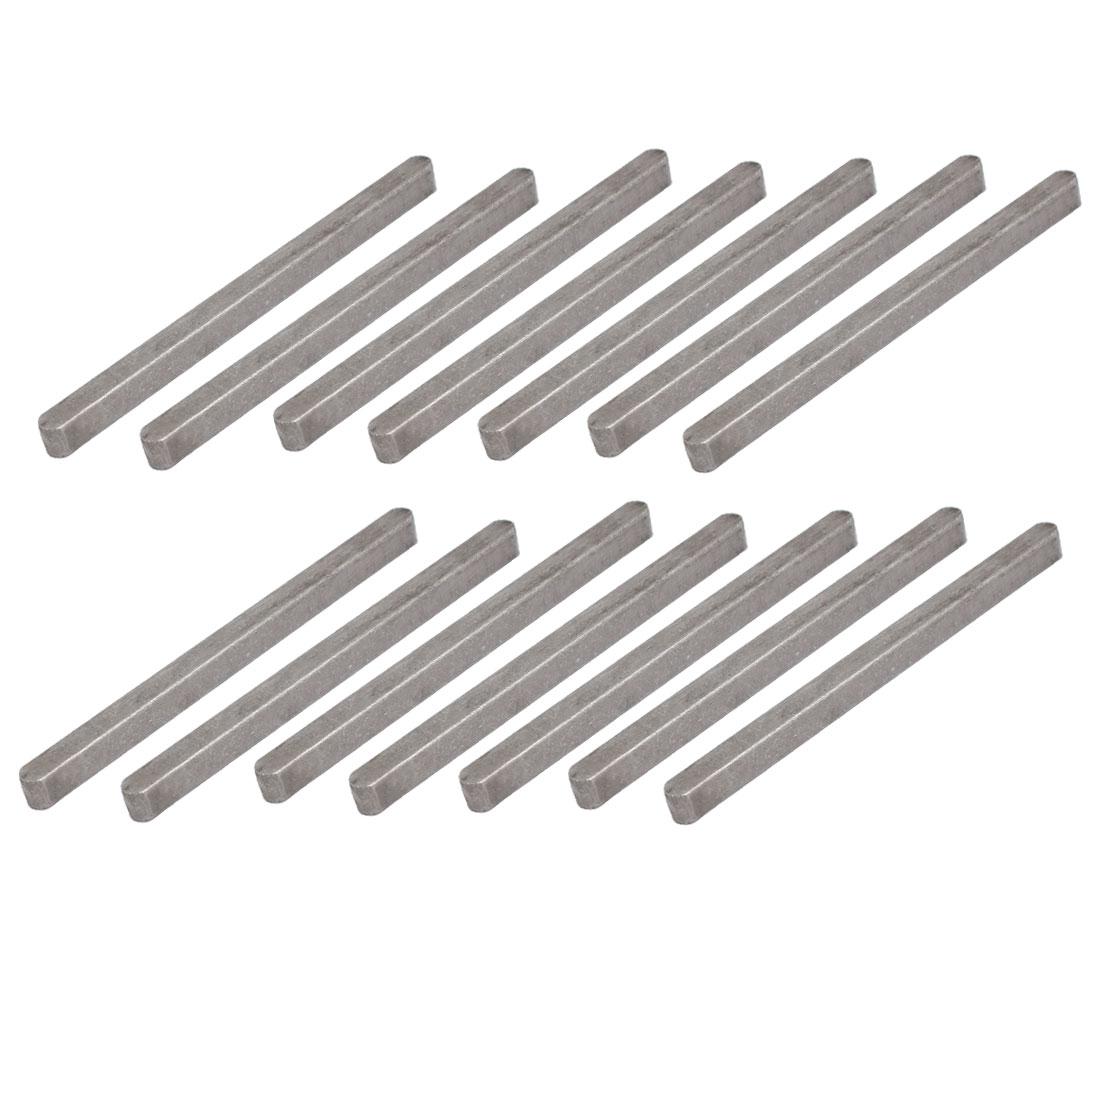 90mmx6mmx6mm Carbon Steel Key Stock To Lock Pulleys 14pcs